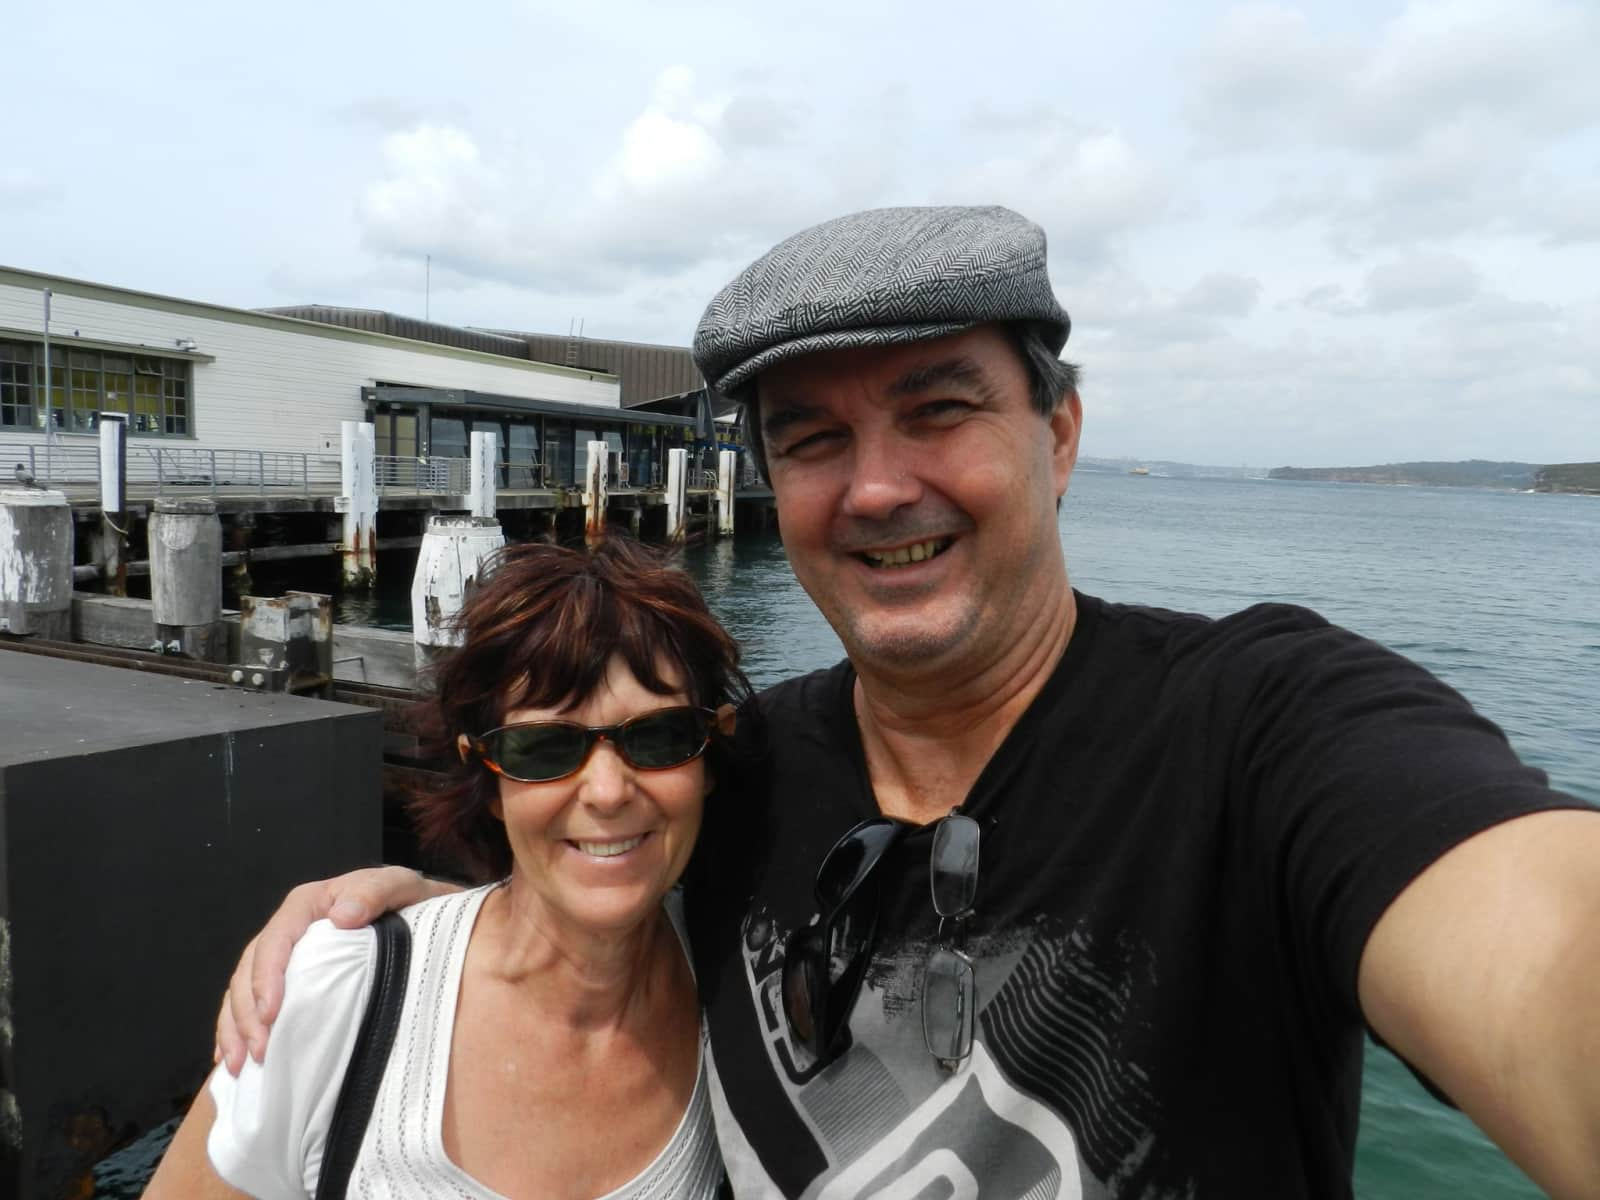 Susan & Roger from Brisbane, Queensland, Australia